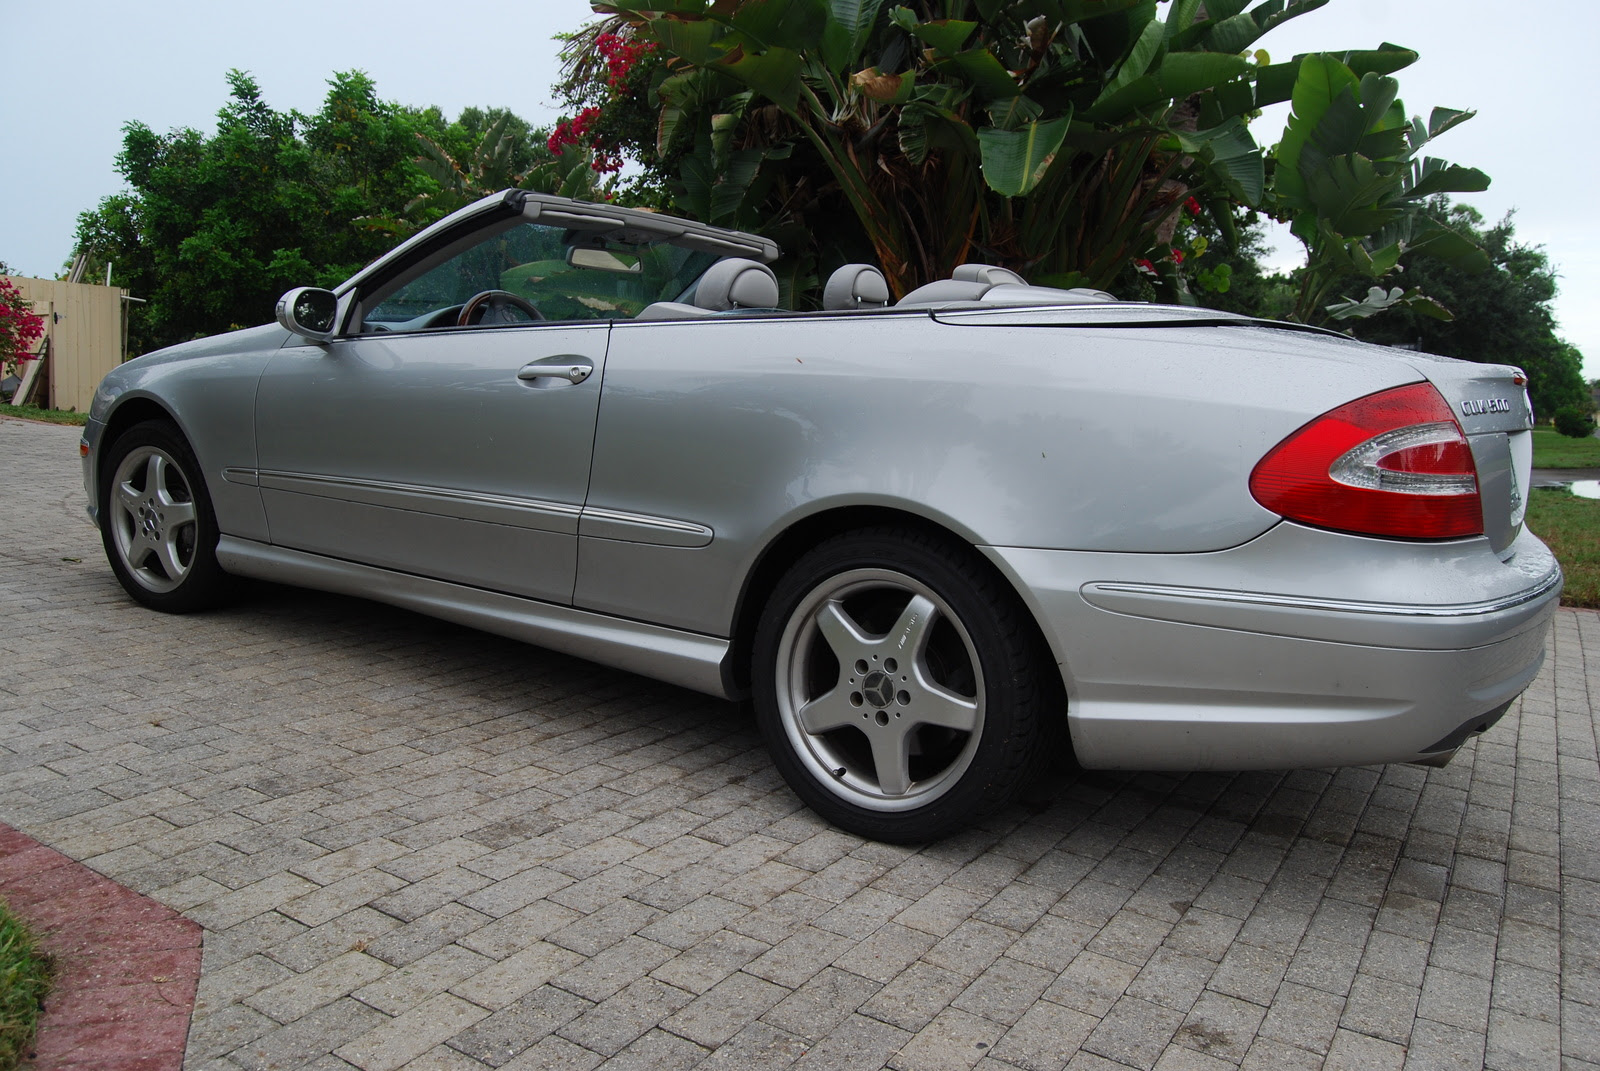 2004 Mercedes-Benz CLK-Class - Pictures - CarGurus